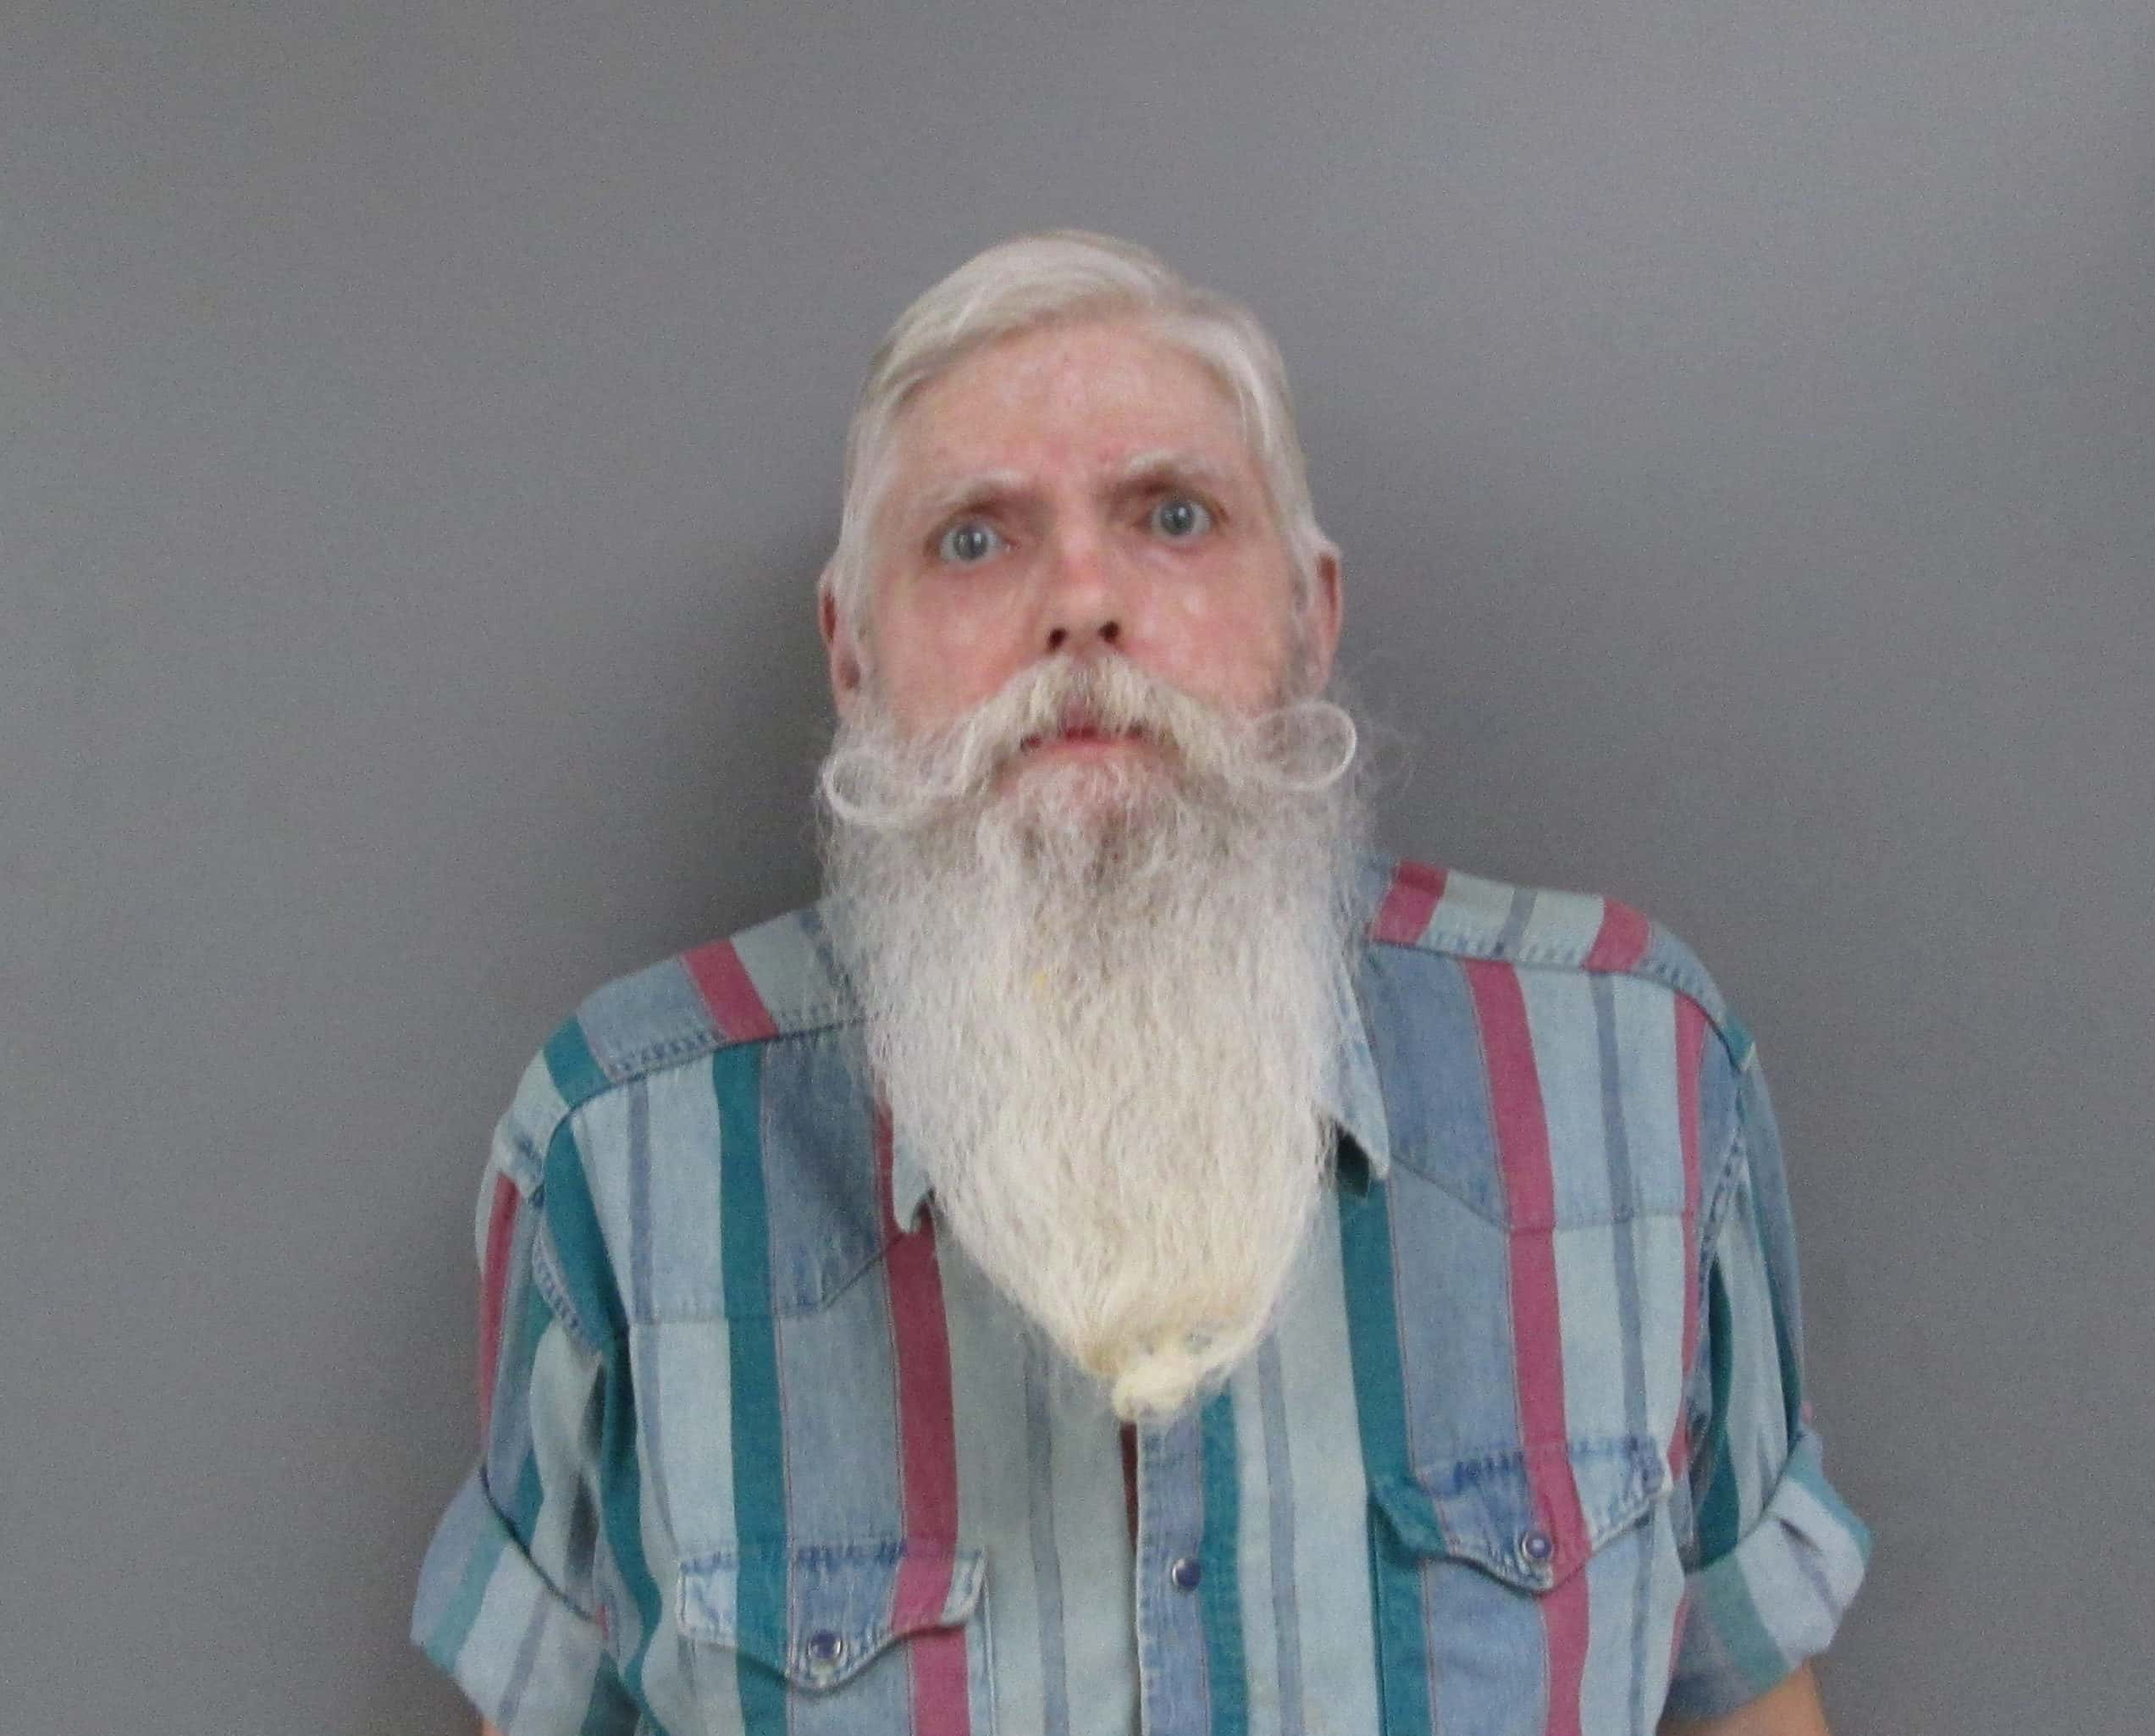 Pella Man Arrested Following Overdose Death Faces Additional